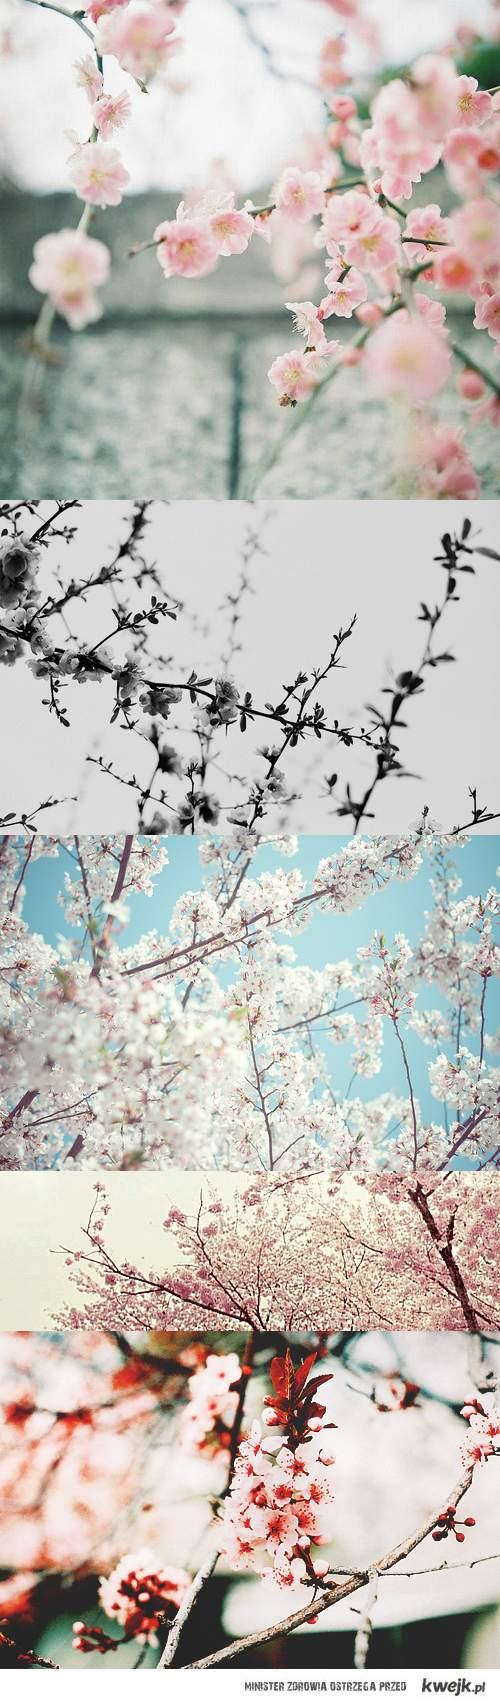 kwiaty wiśni - sakura love